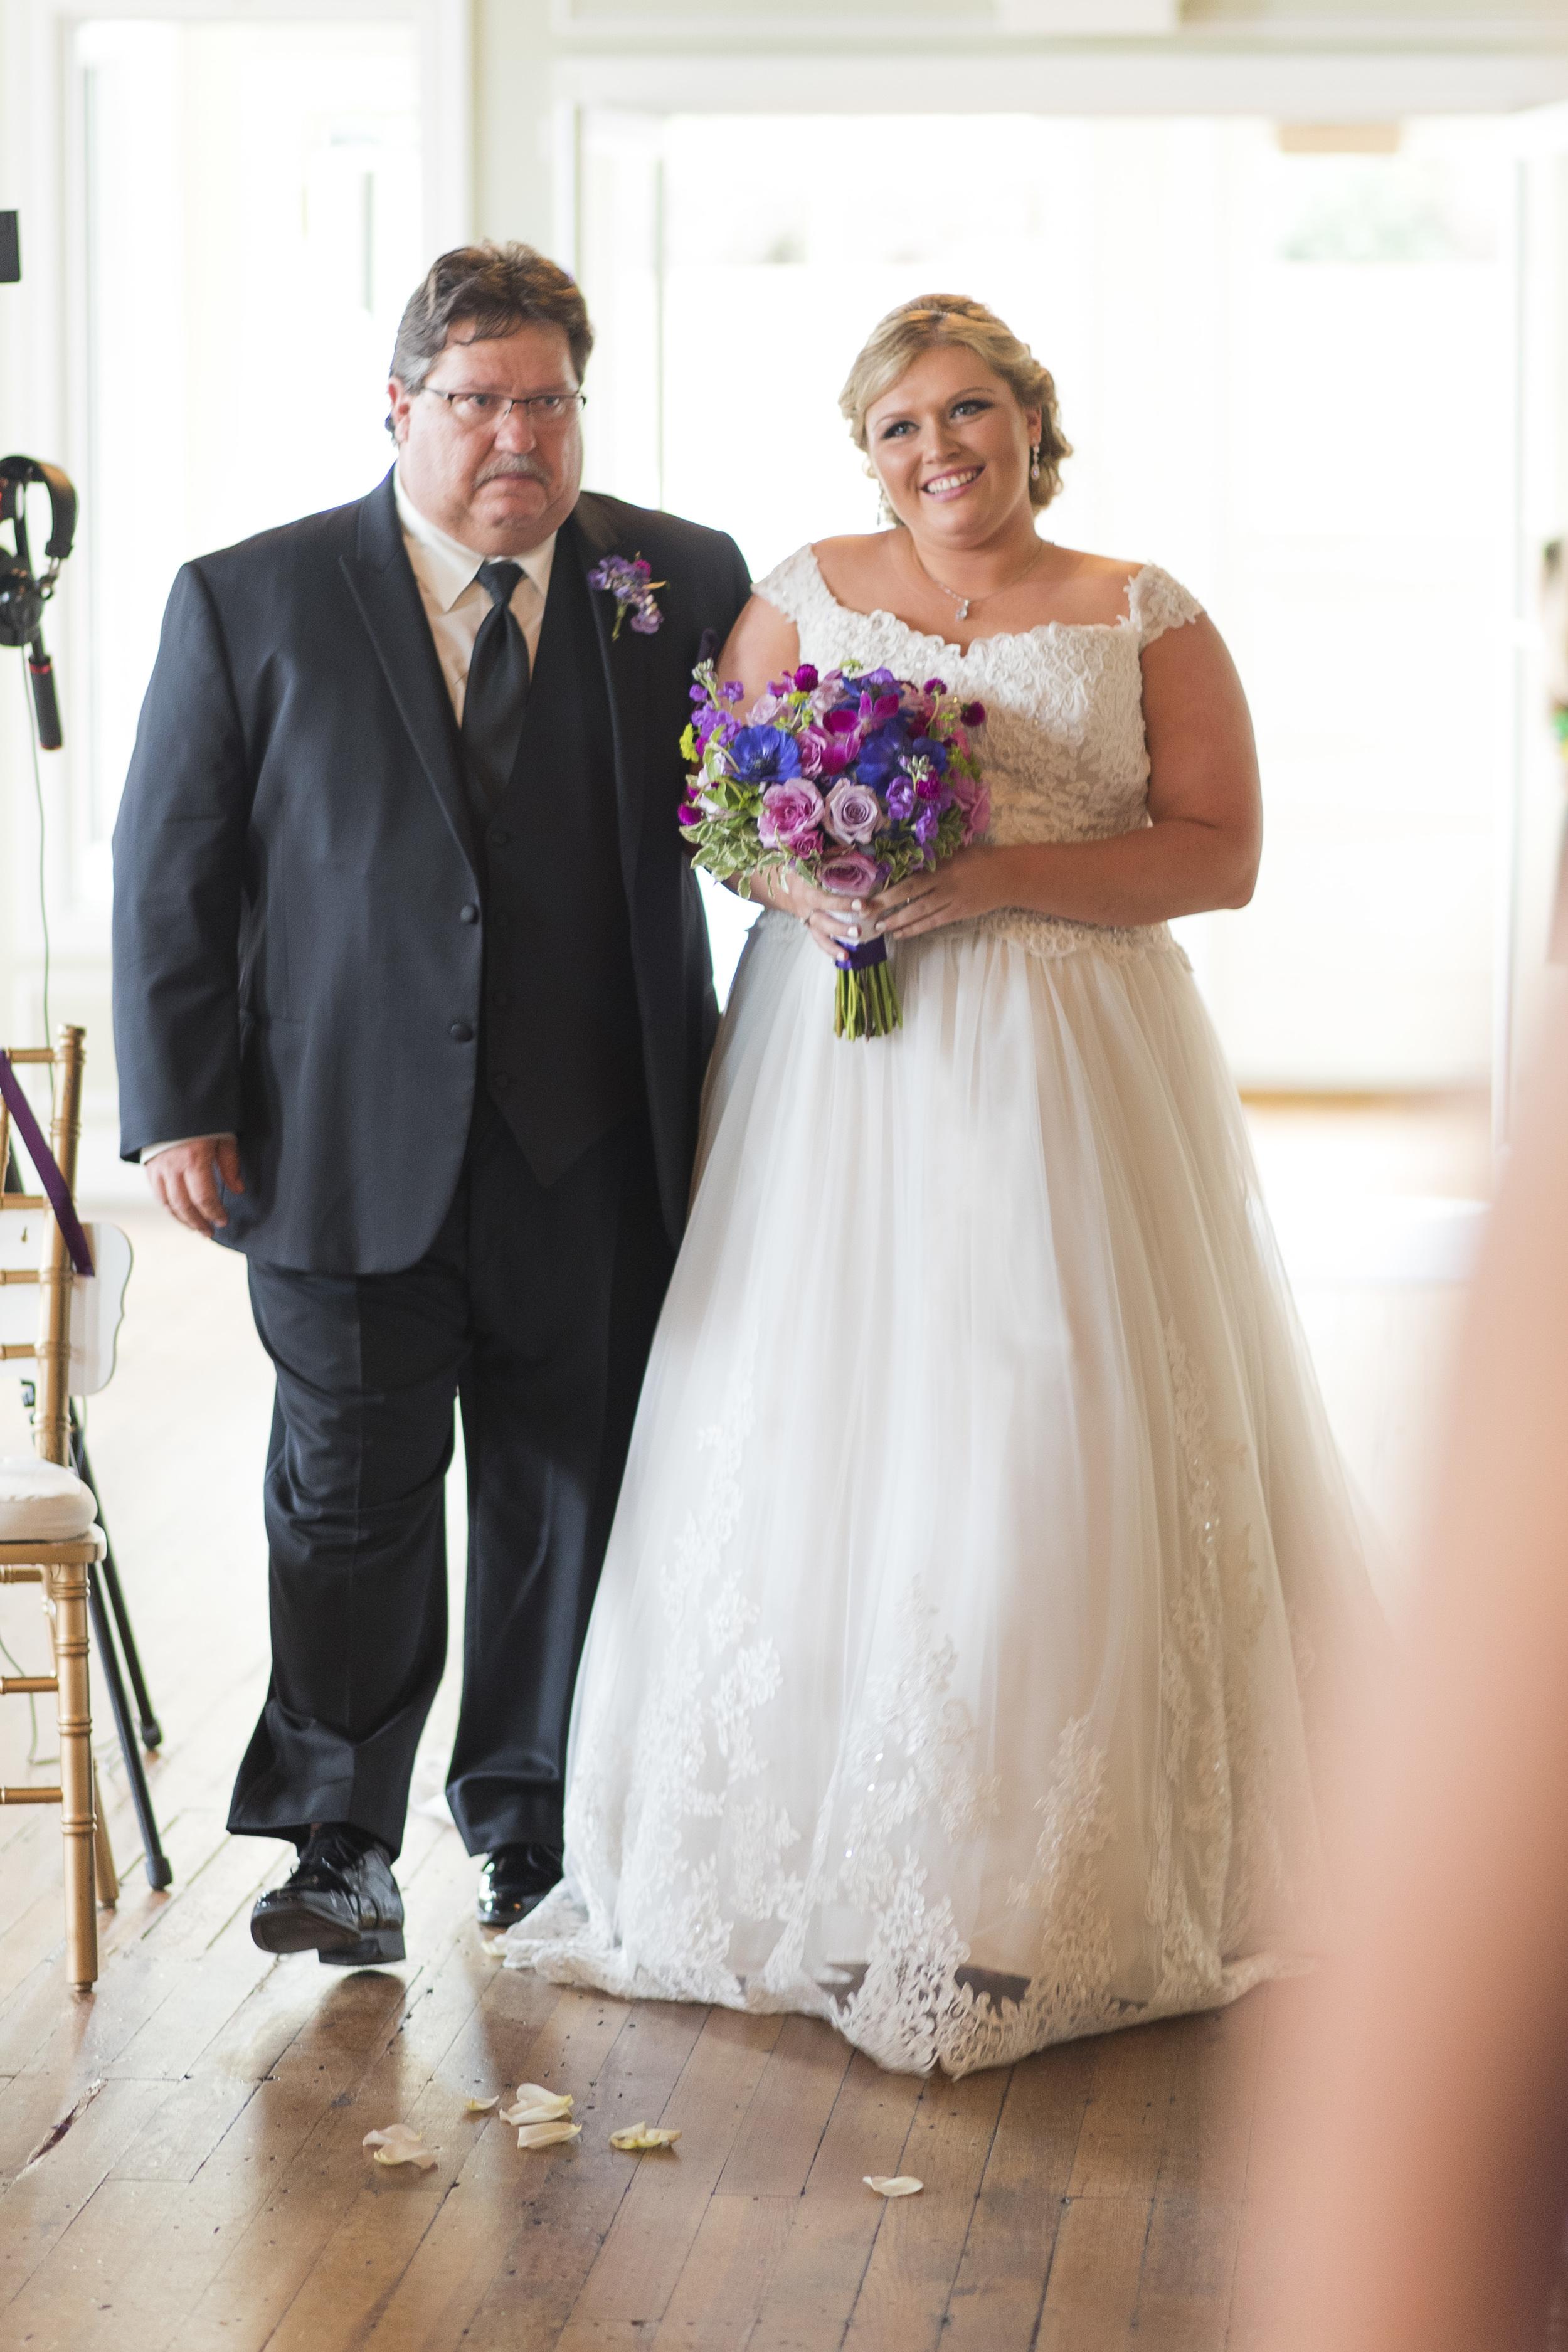 Lynchburg_VA_Wedding_Tresca on 8th_Downtown_Purple_elegant_Photos886.jpg